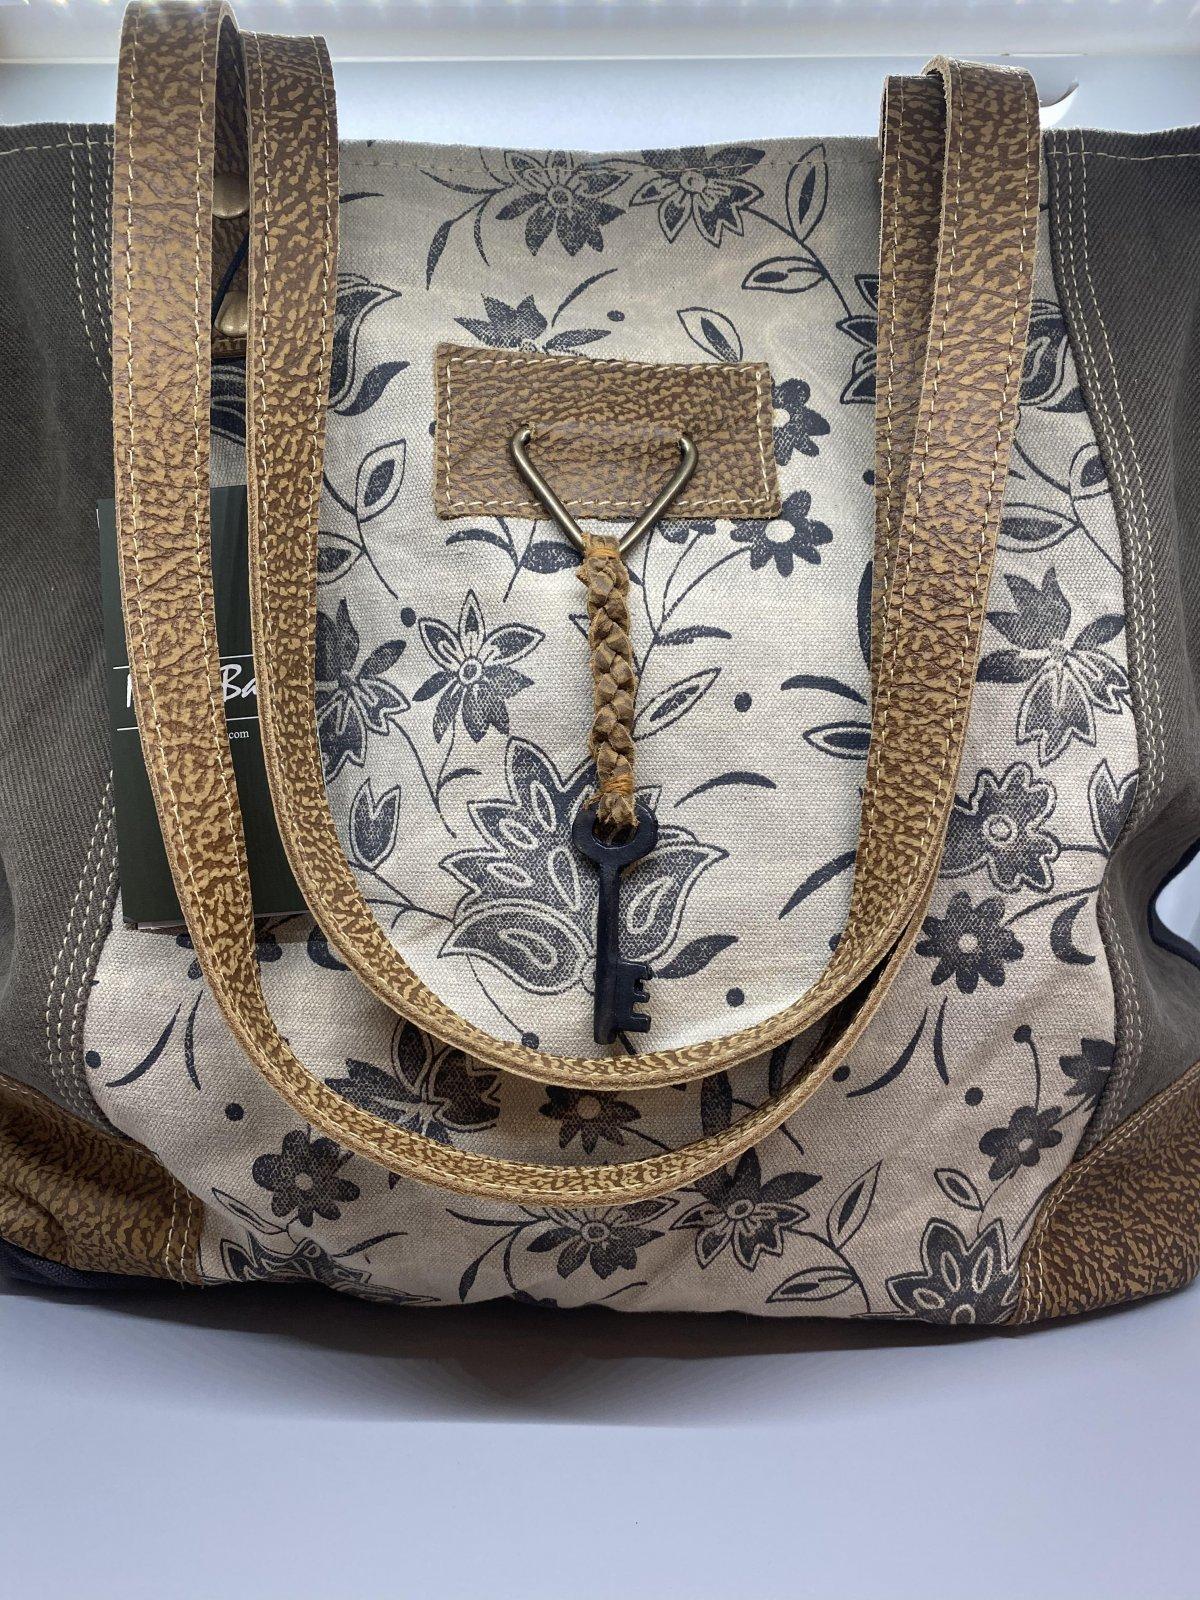 Unique Key Tote Bag